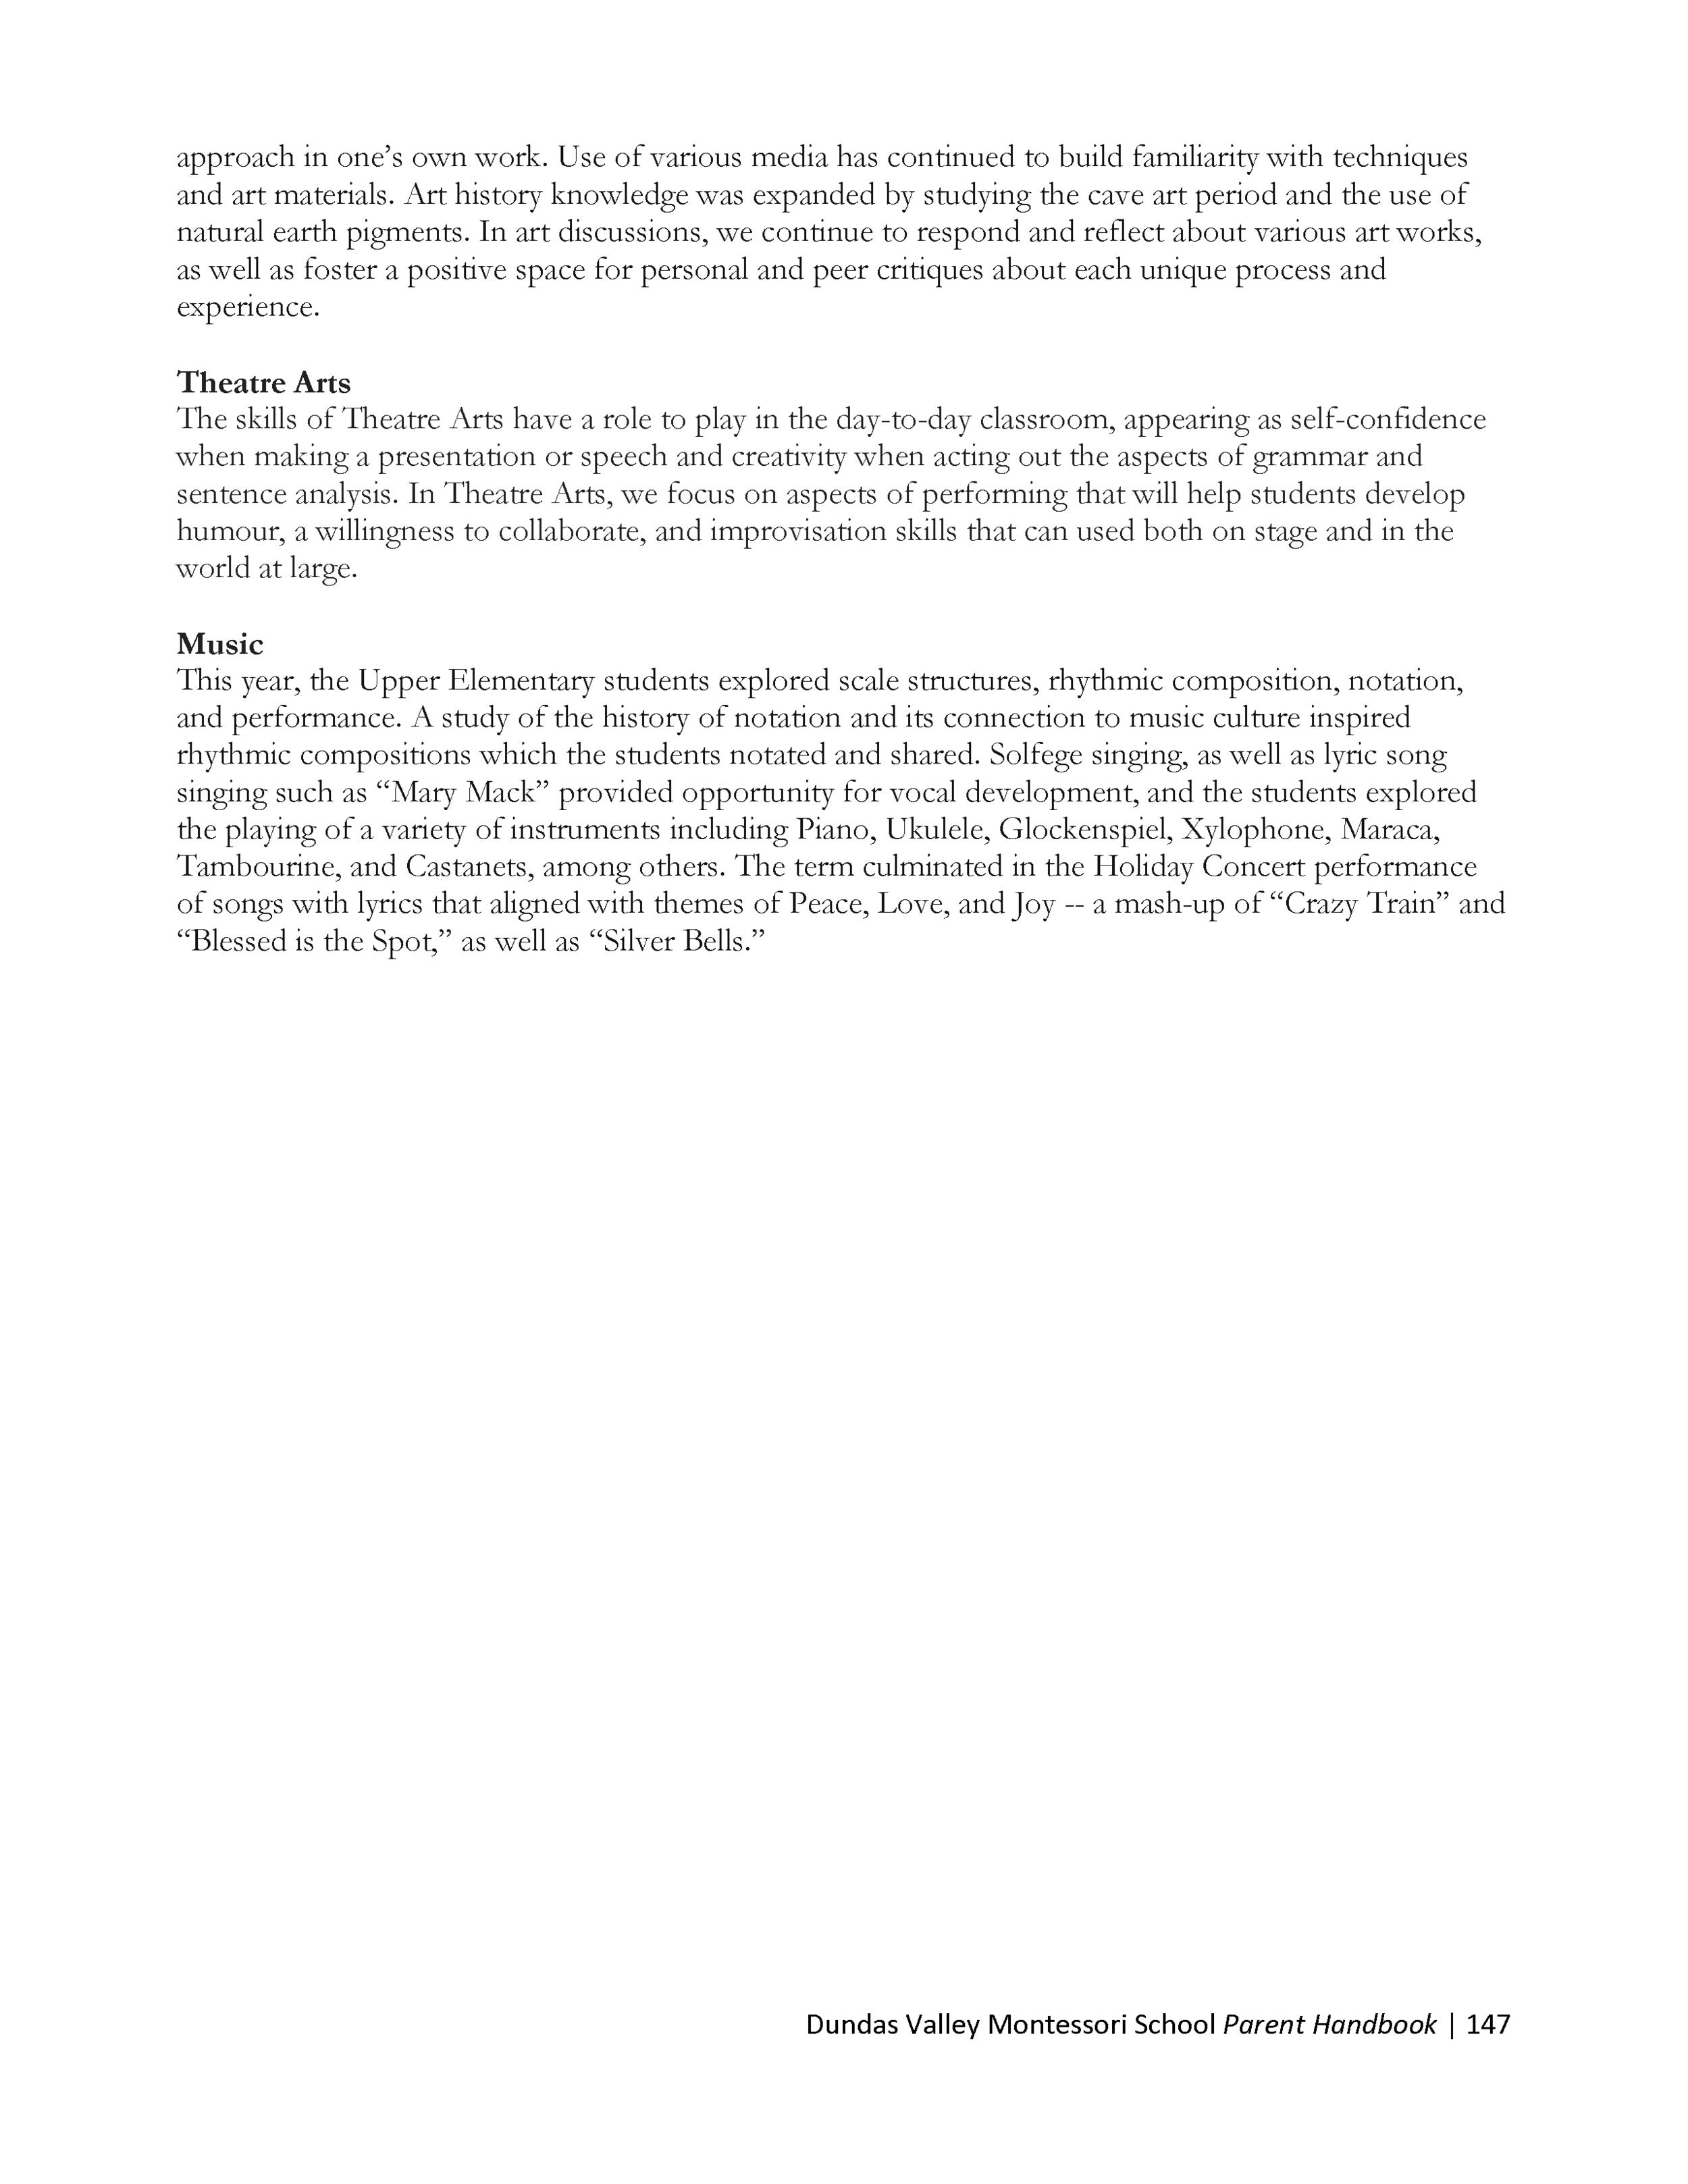 DVMS-Parent-Handbook-19-20_Page_149.png